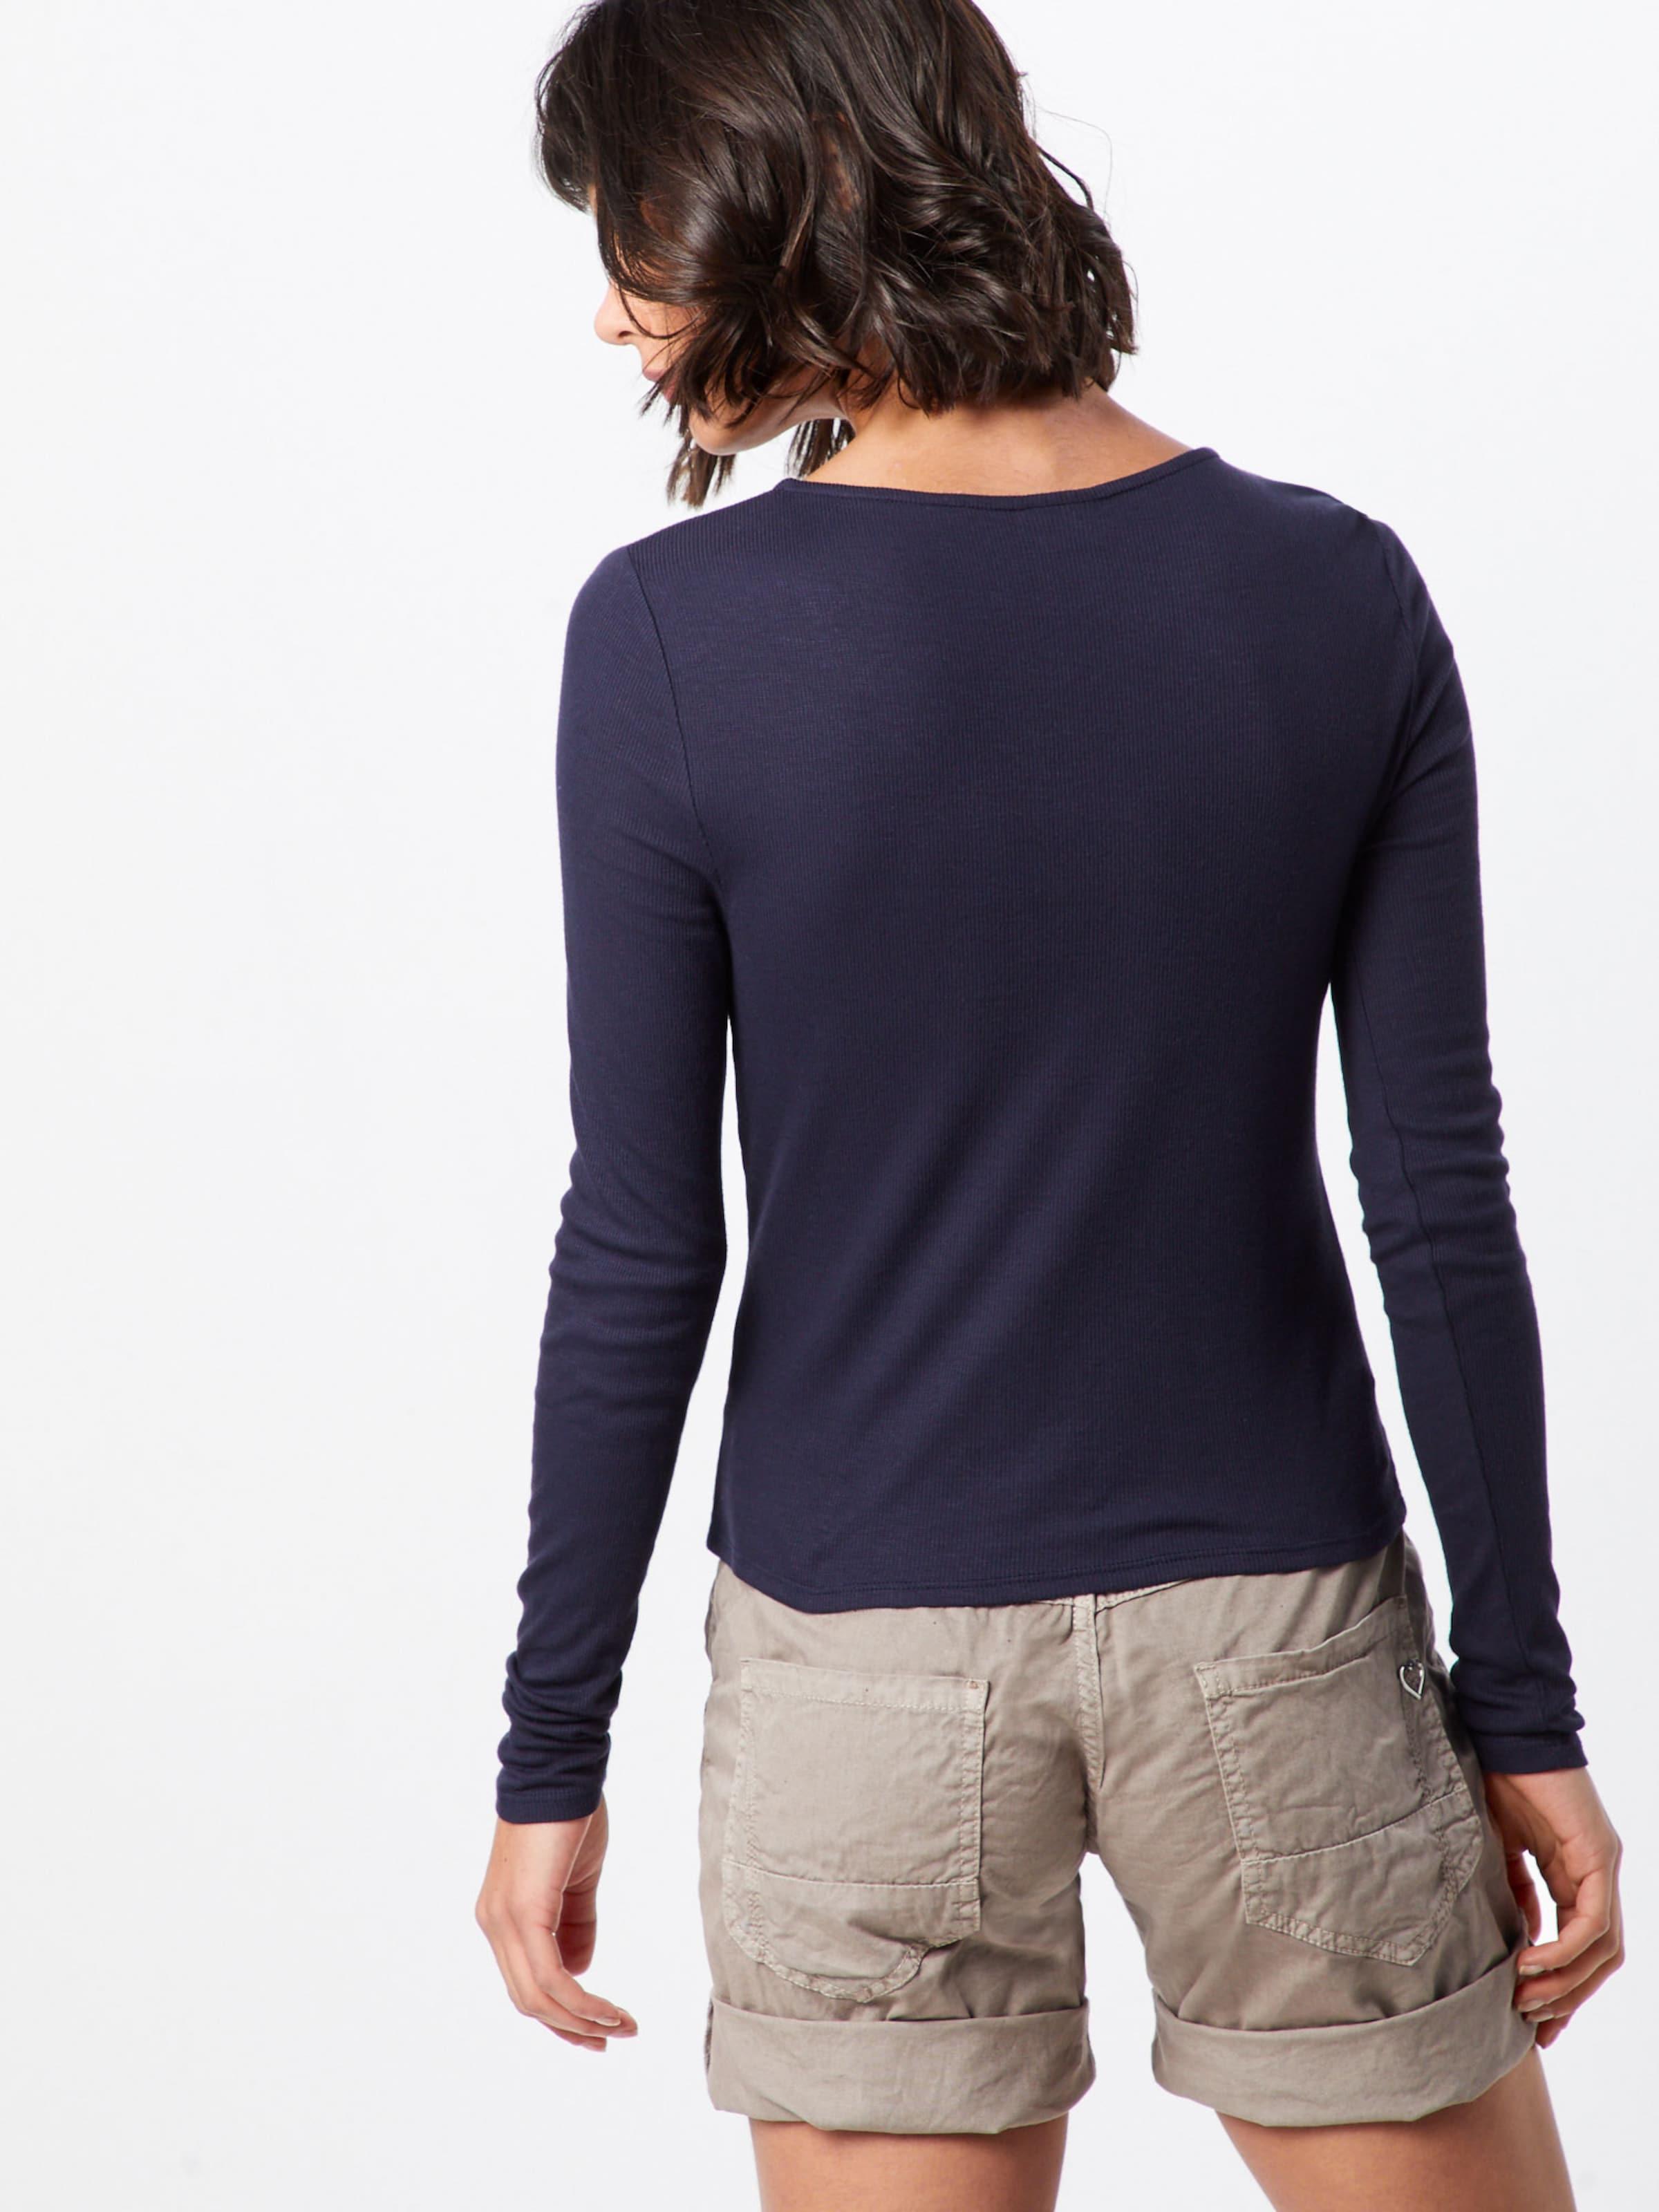 May T 'nmhenley shirt L Nuit Bleu Noisy s' En 0wP8OkXn